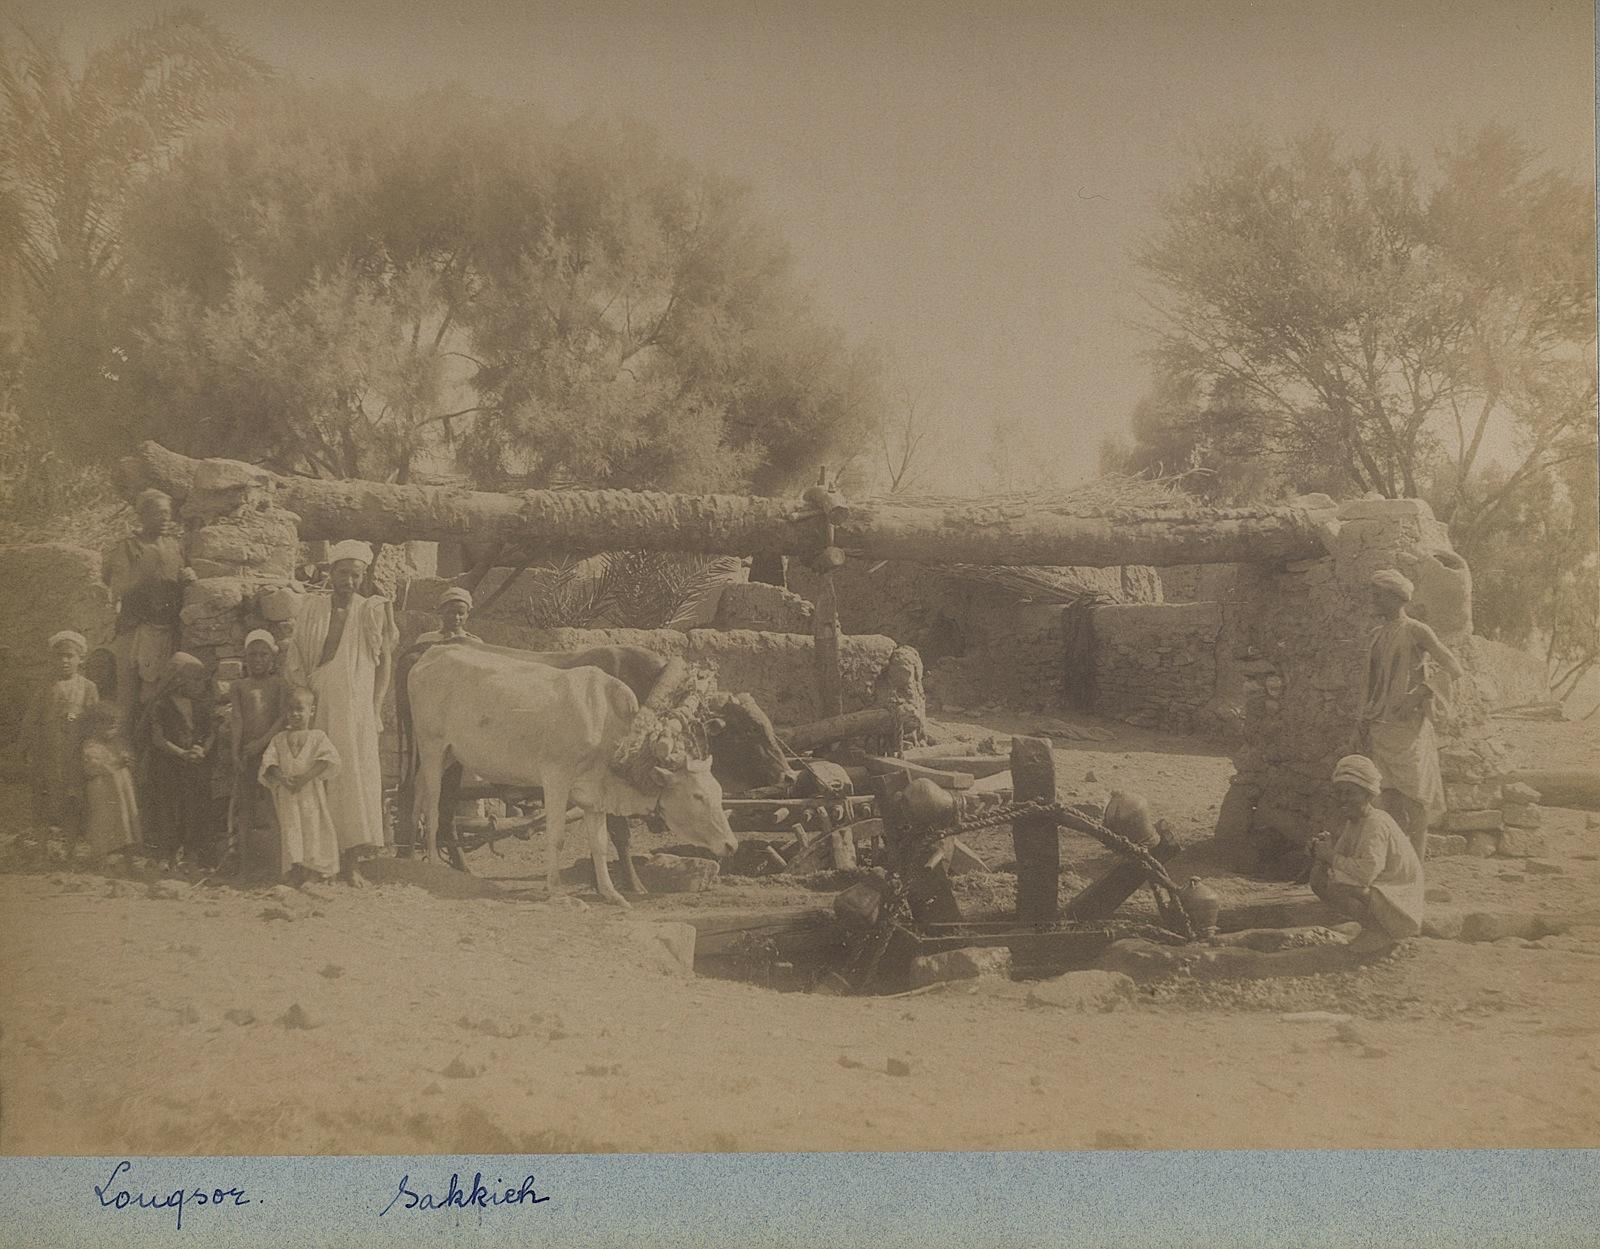 165-Beato-Louqsor-Sakkieh